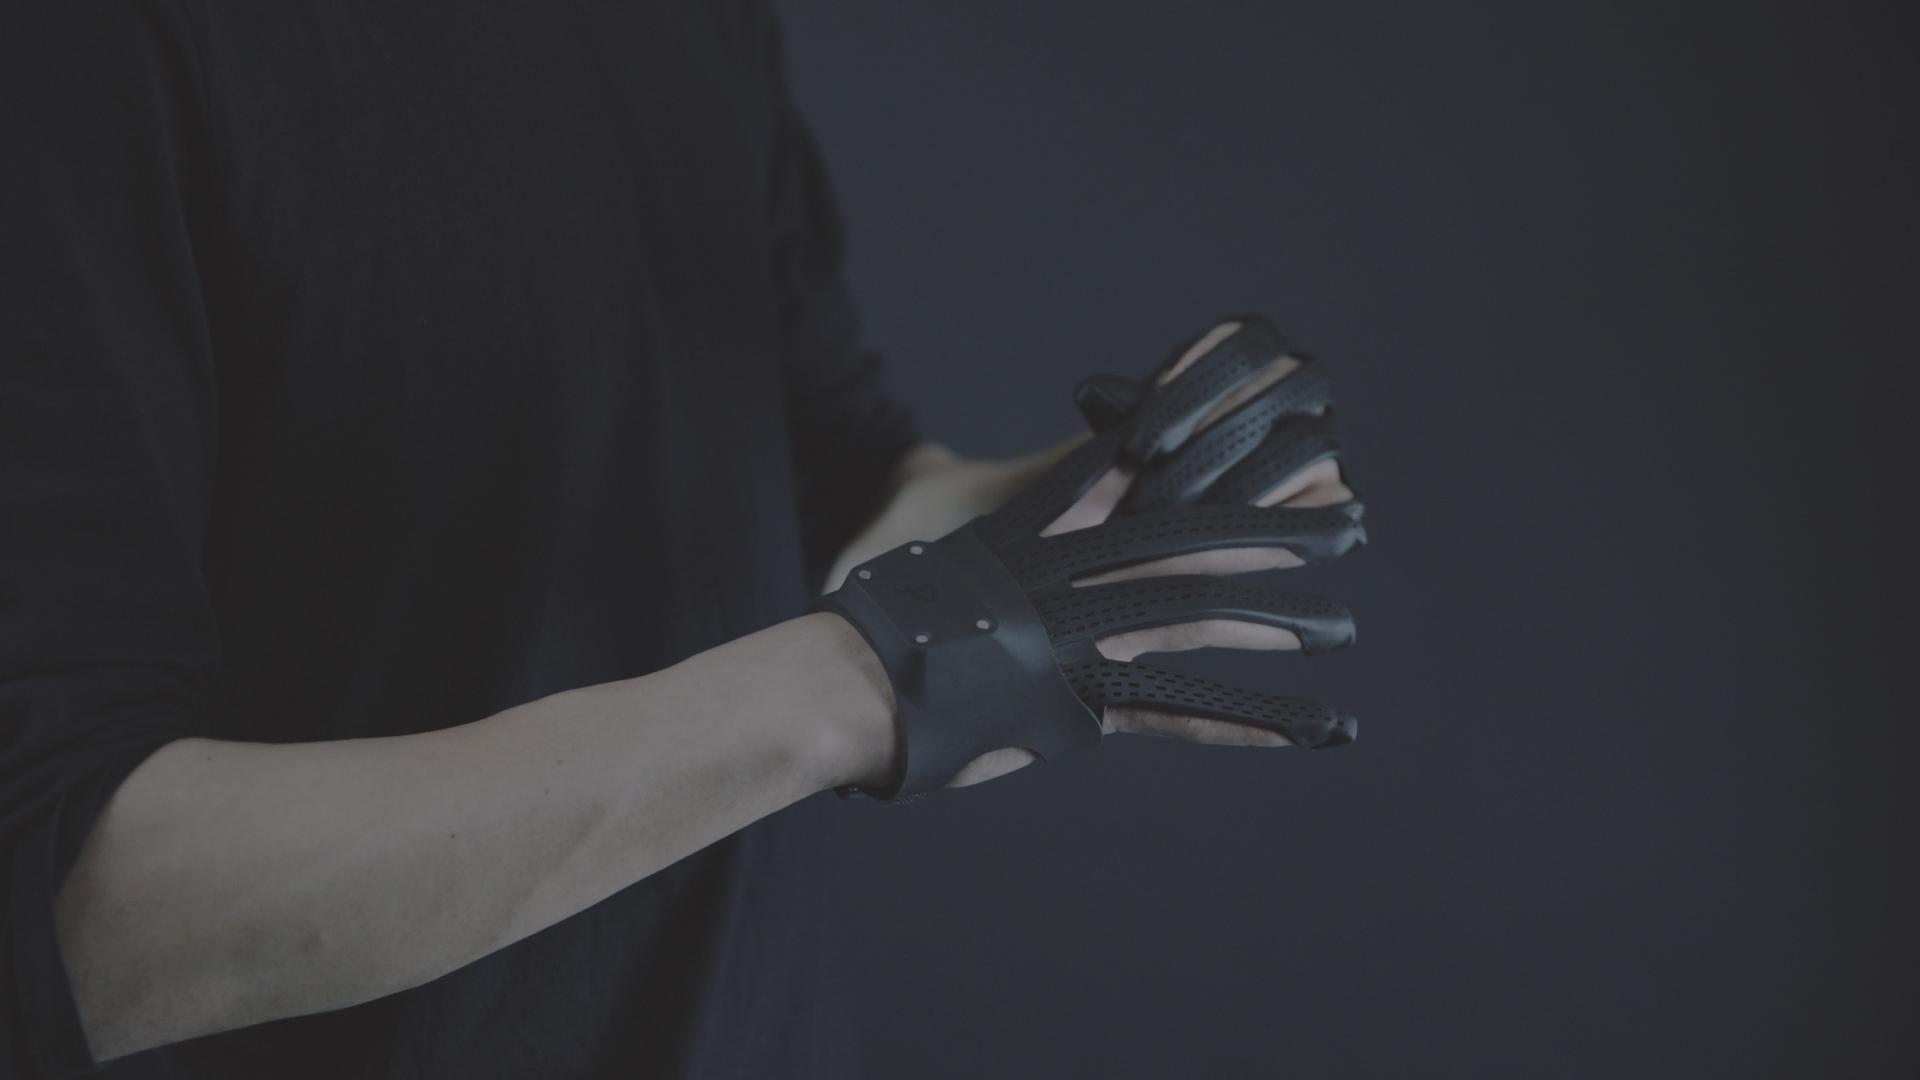 Plexus / High-performance VR/AR Gloves